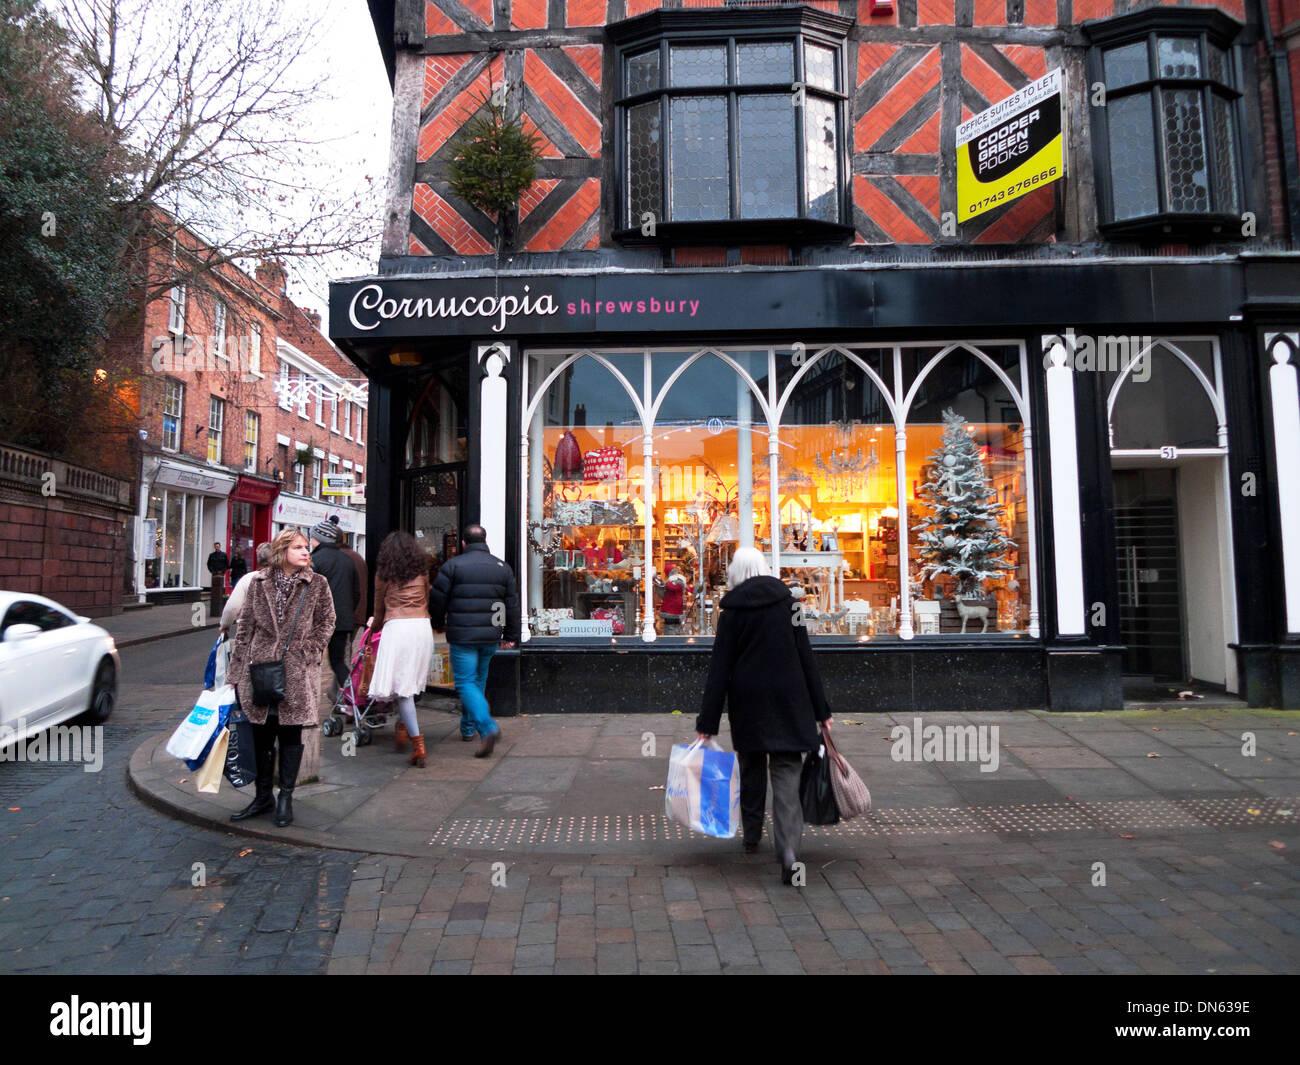 Christmas Cornucopia Stockfotos & Christmas Cornucopia Bilder - Alamy